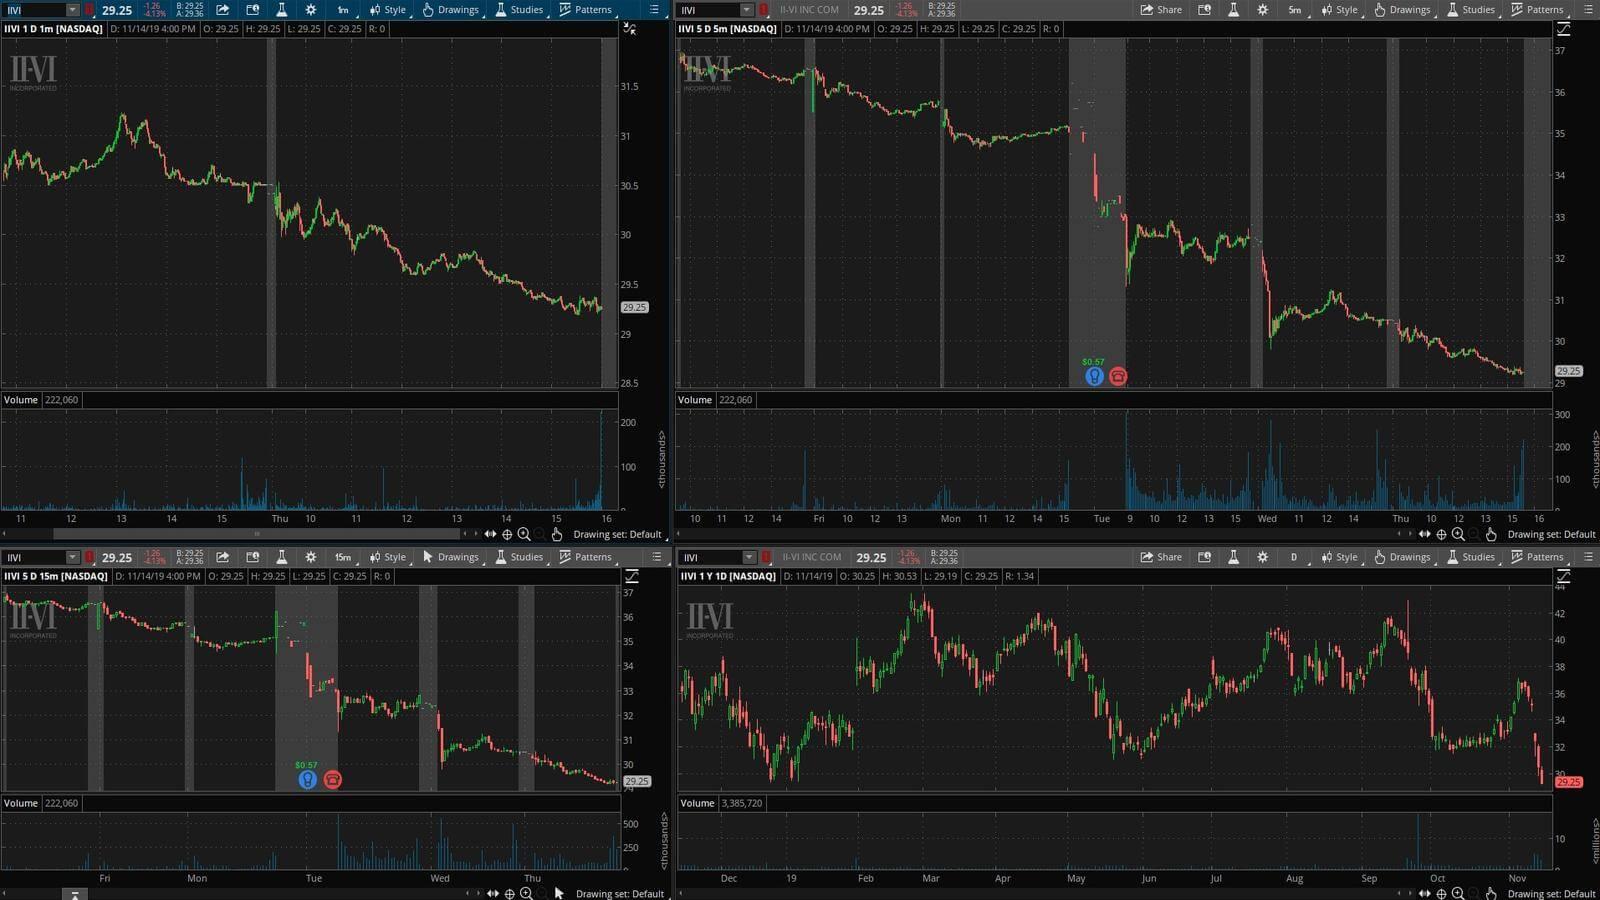 IIWI - график акции на фондовой бирже